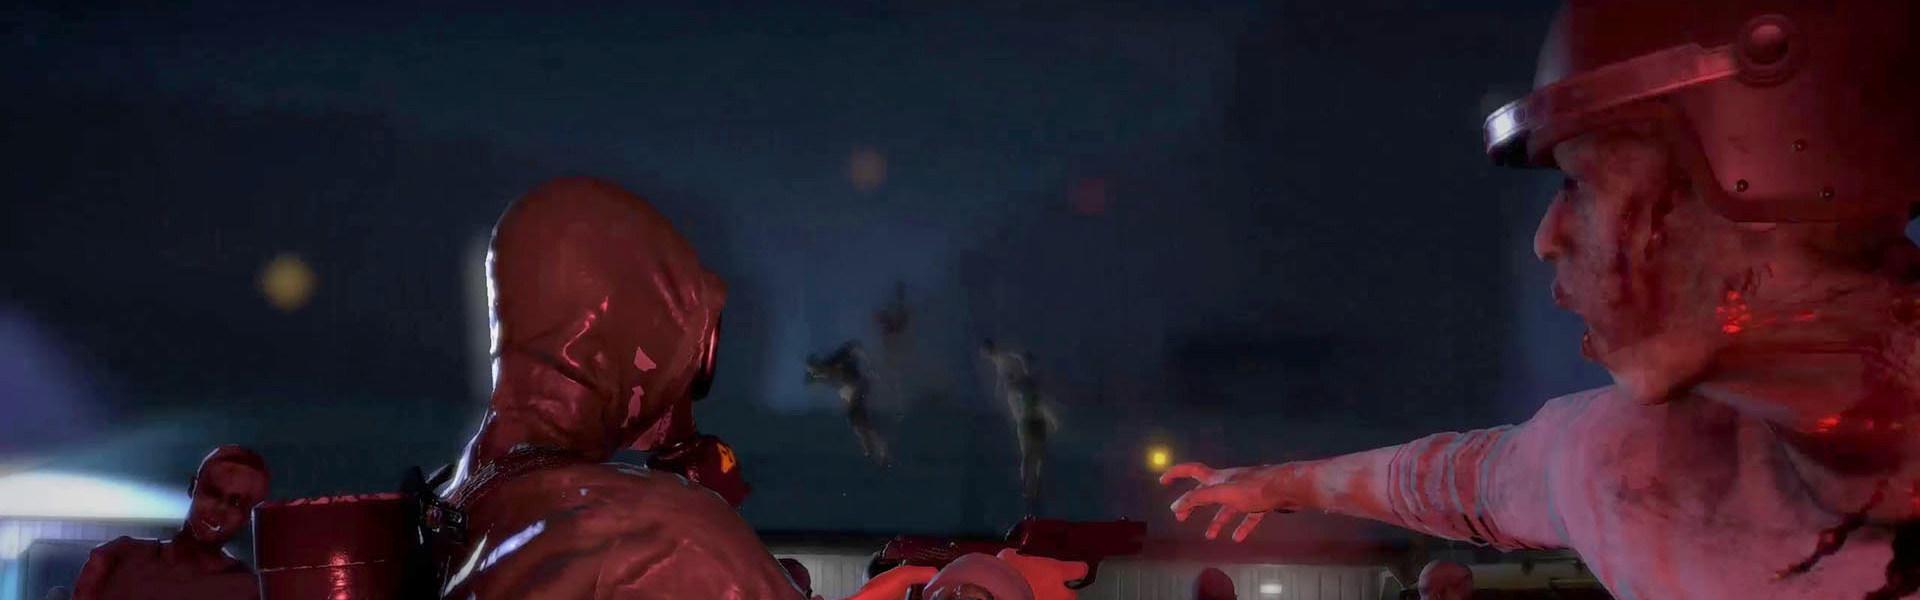 Arizona Sunshine - Dead Man (DLC) Steam Key GLOBAL